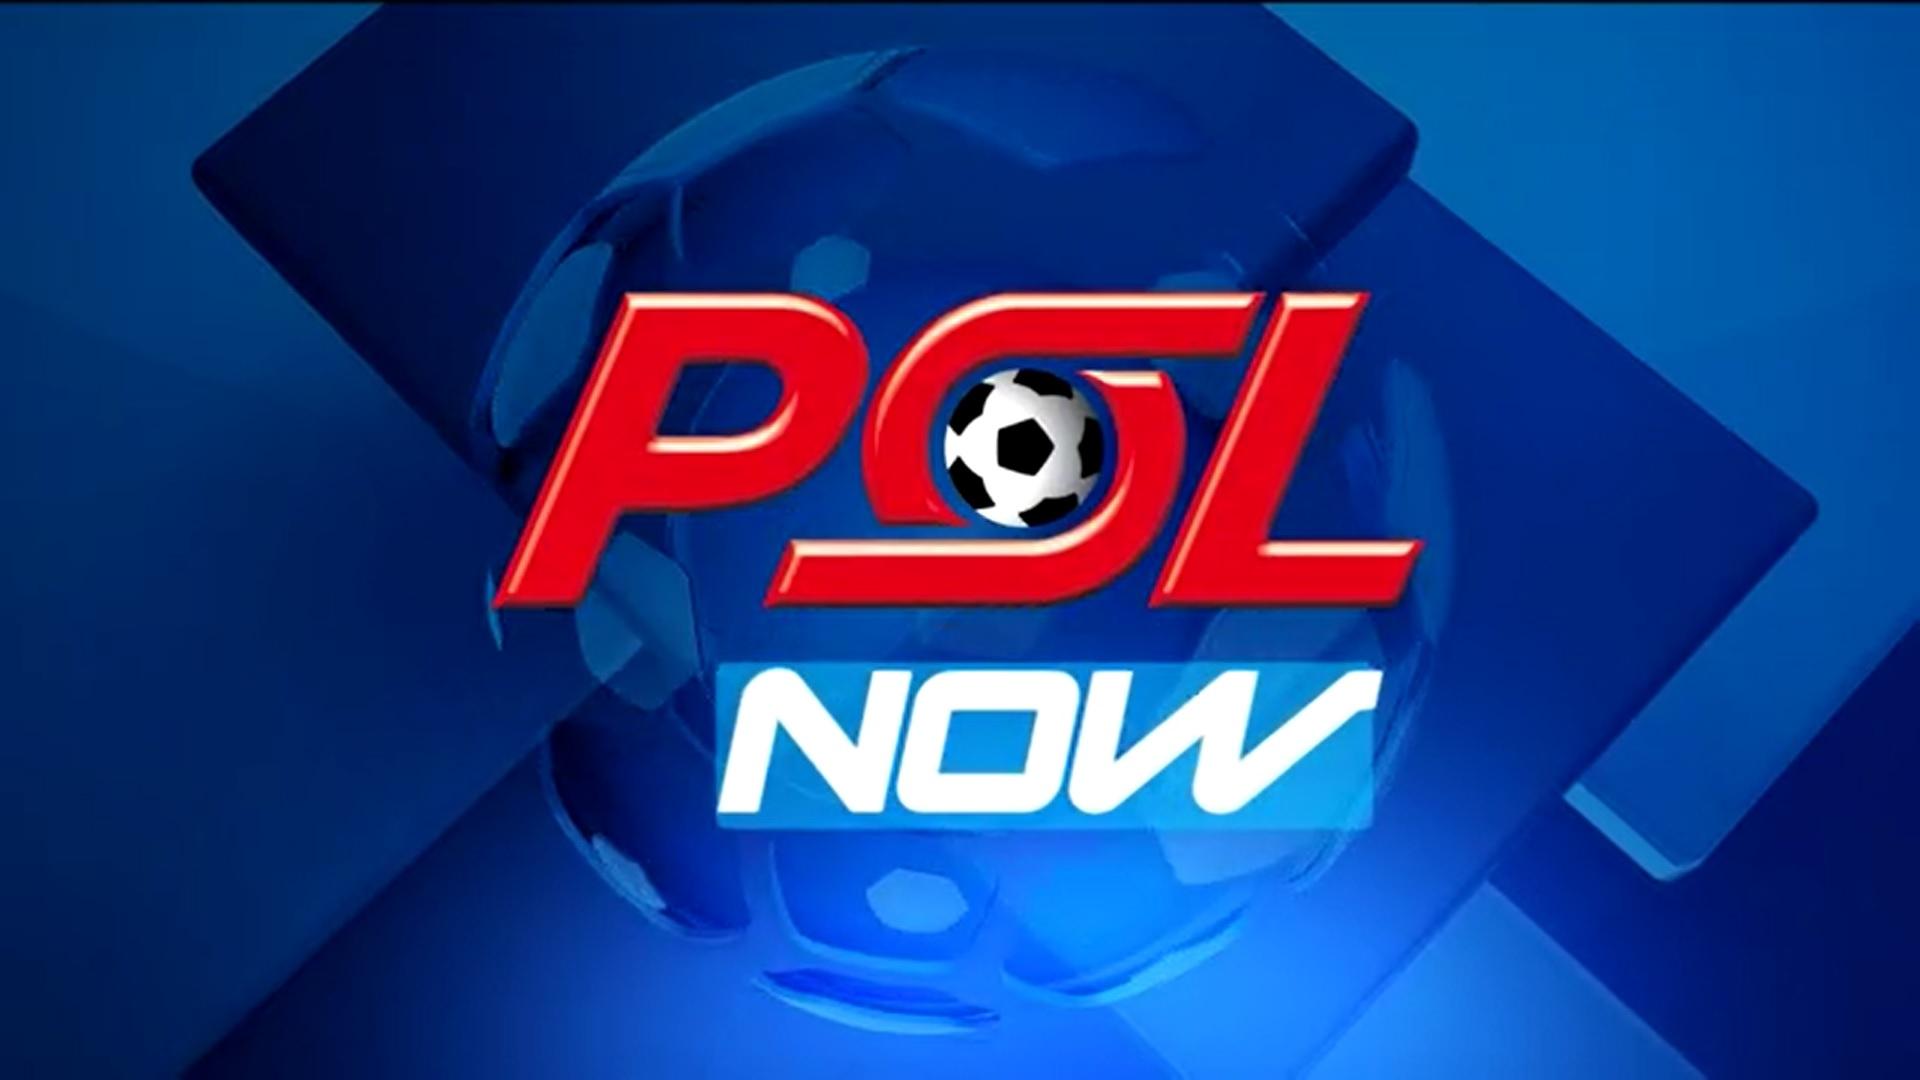 DStv Premiership | PSL Now | Episode 4